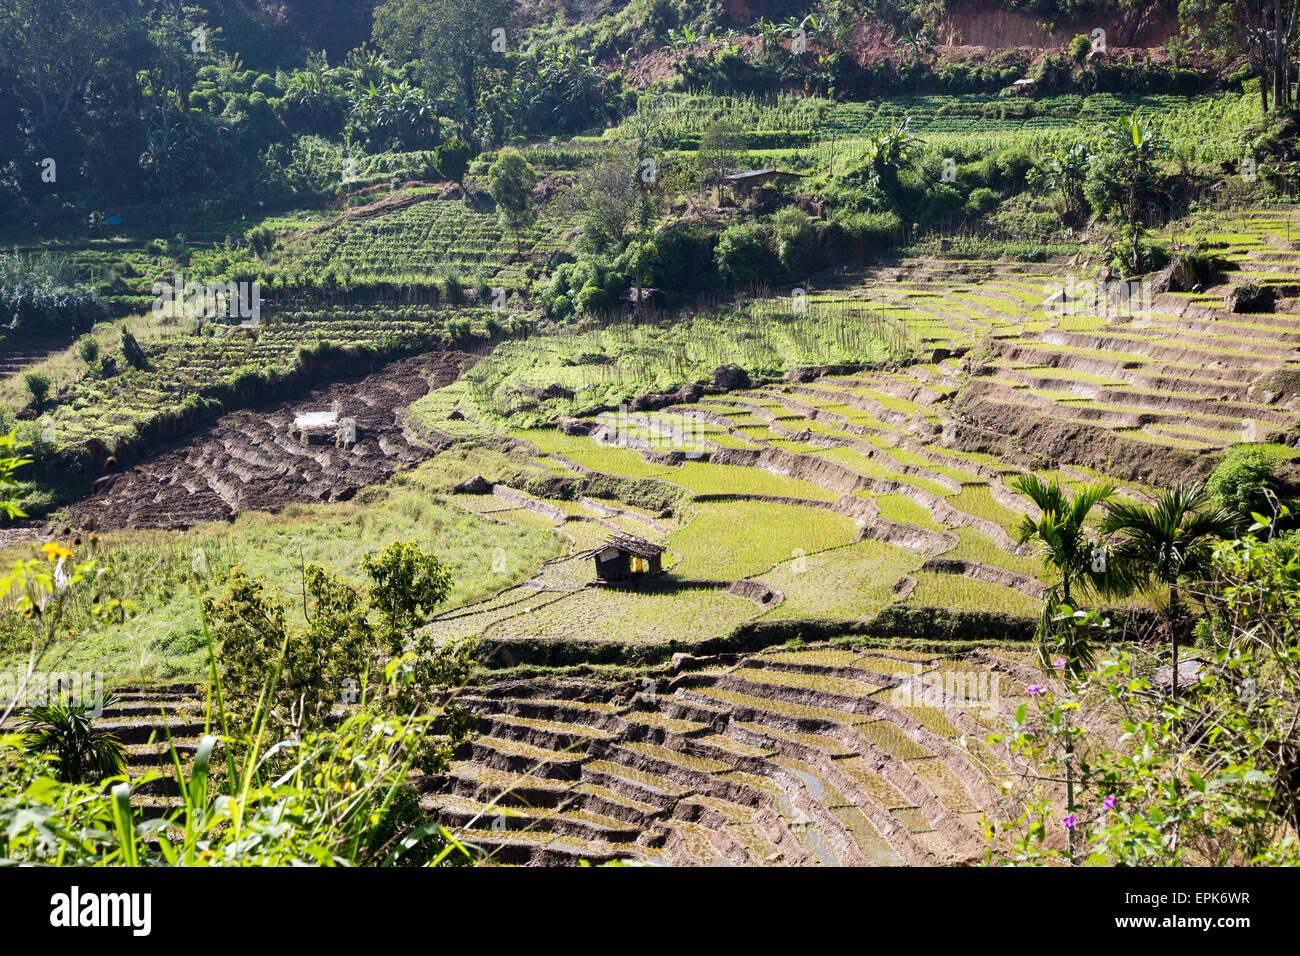 Paddy field rice farming terraces, Ella, Badulla District, Uva Province, Sri Lanka, Asia Stock Photo